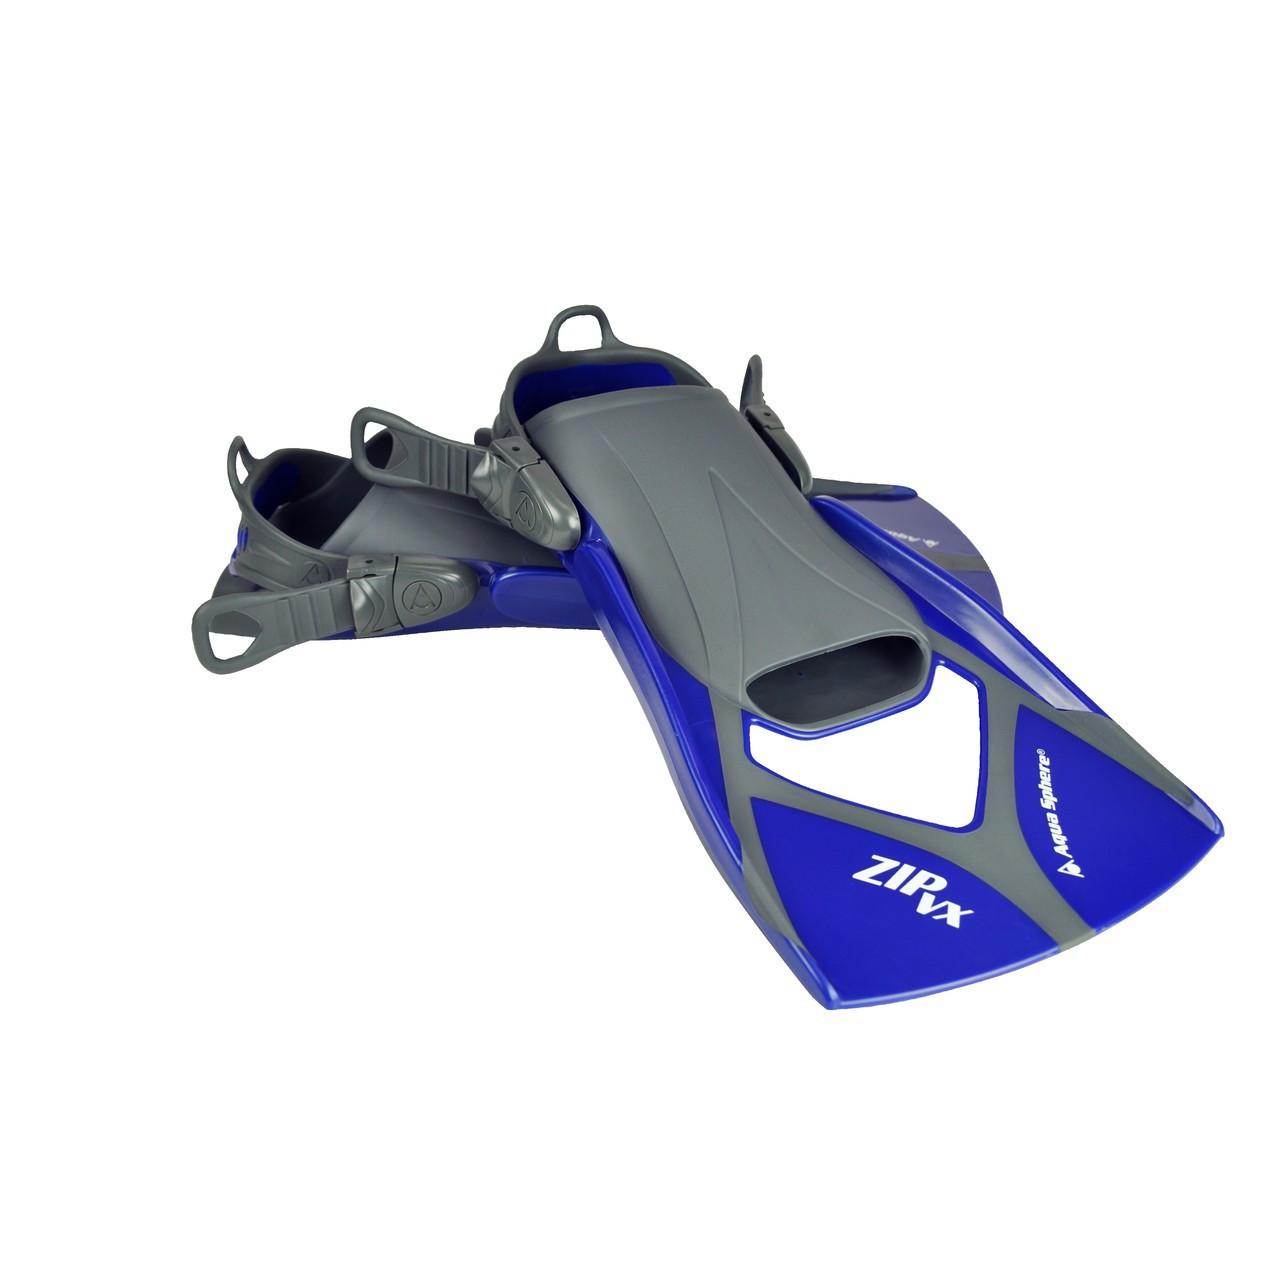 Aqua Sphere Zip VX Swim Fin - 2019 price